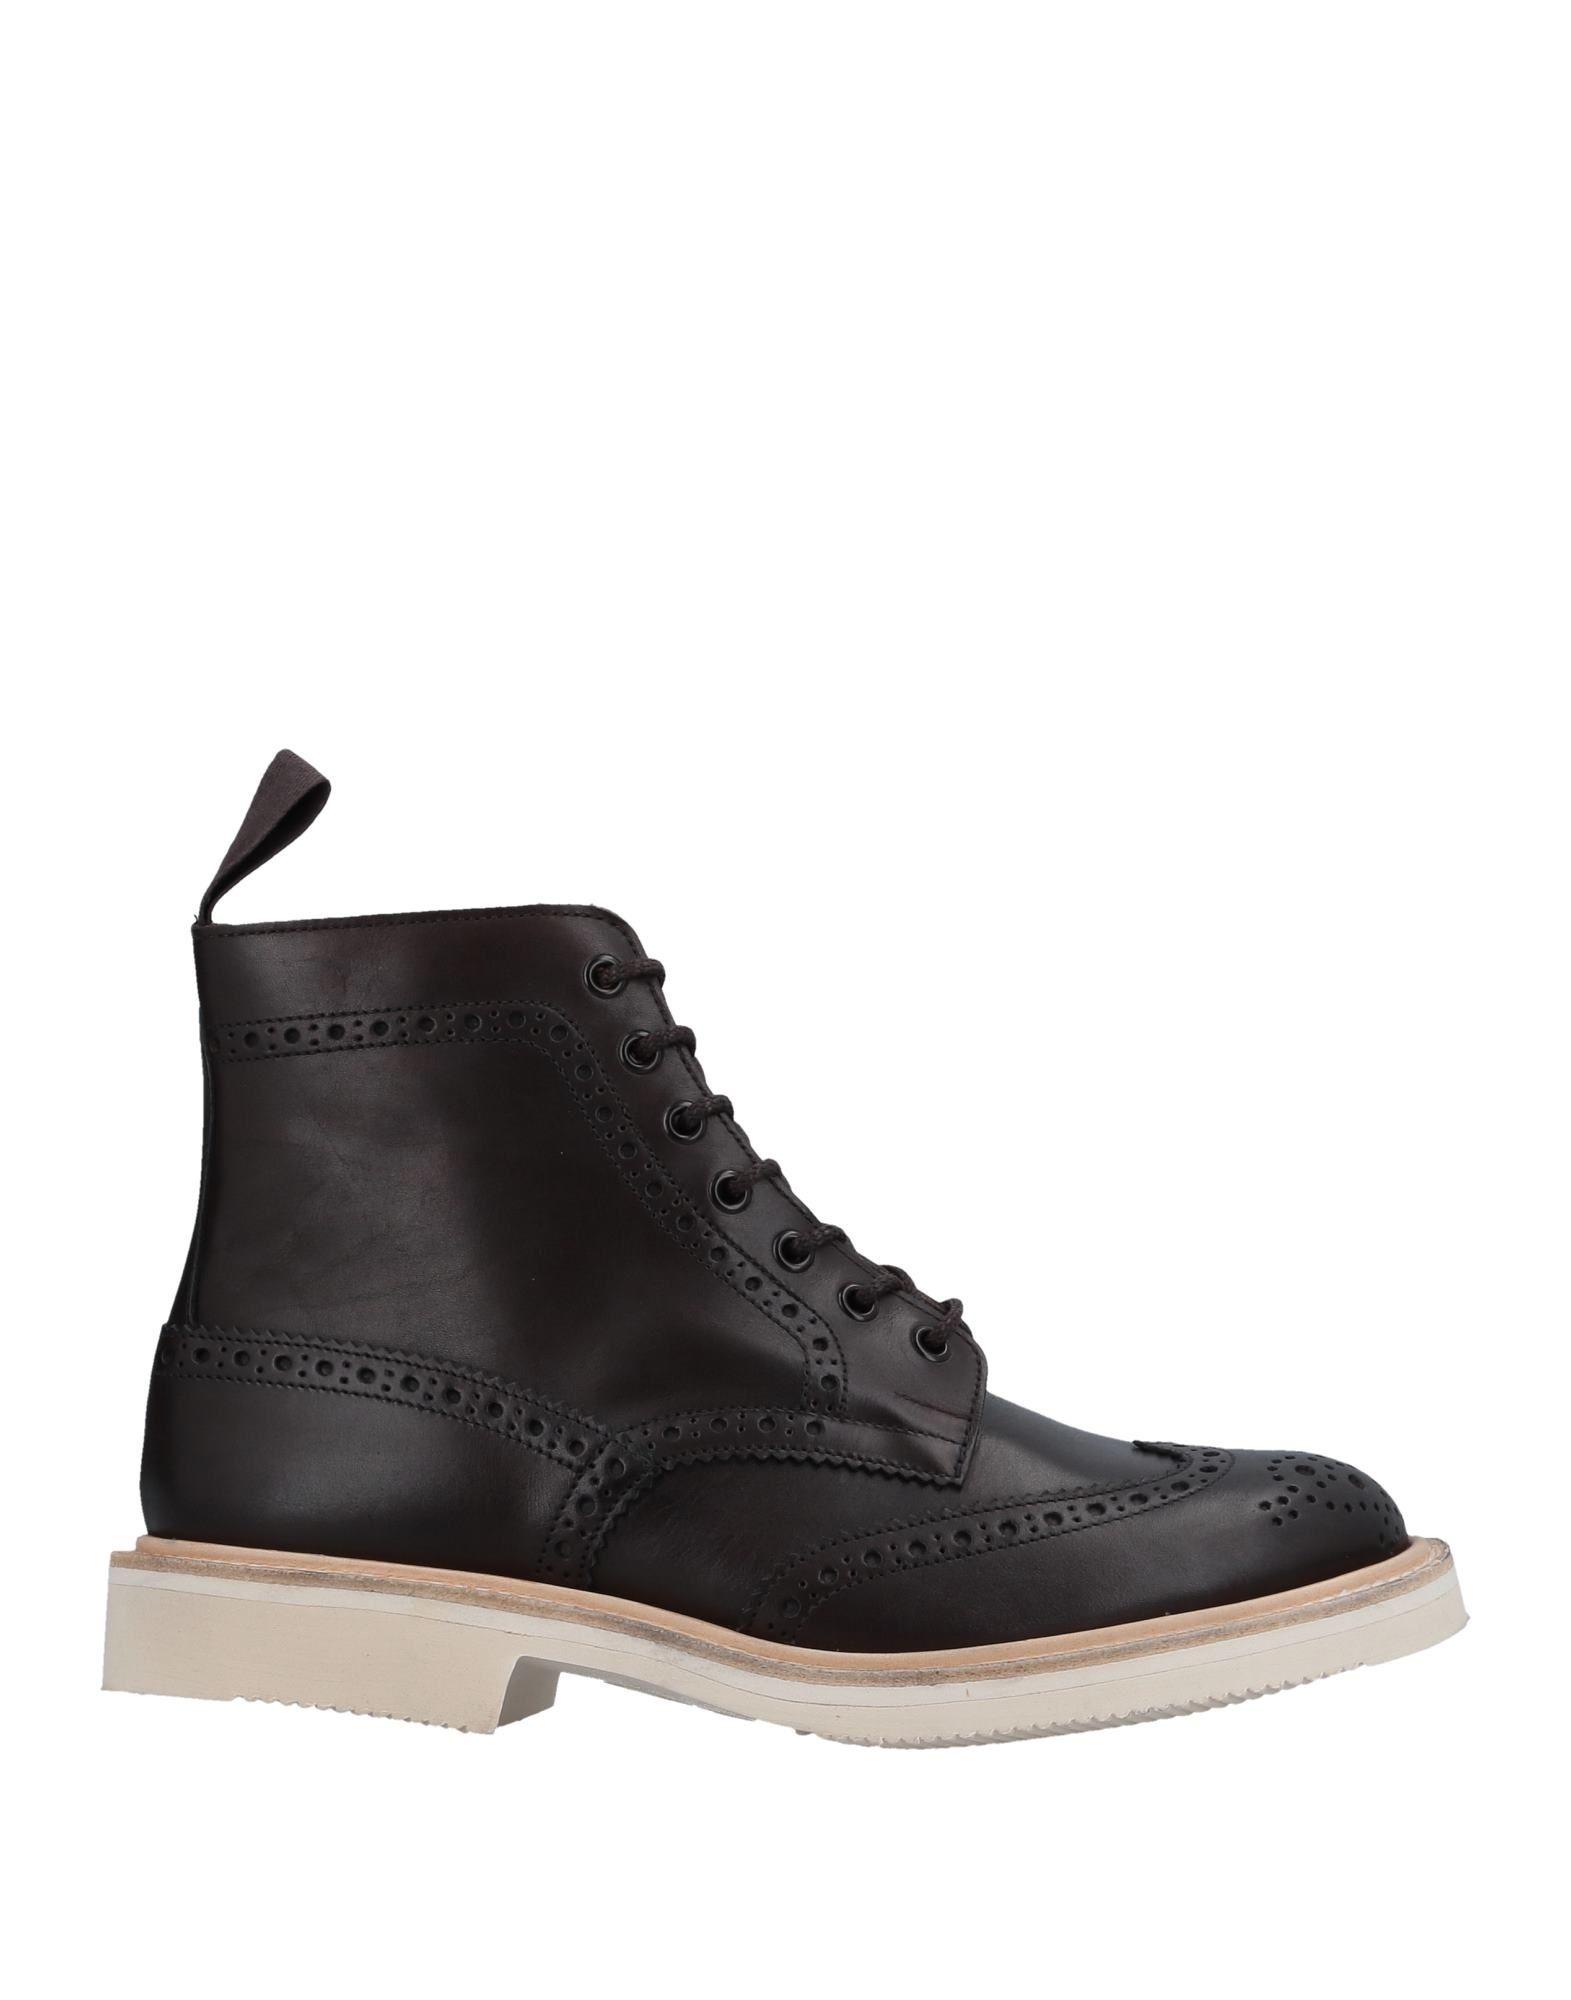 Tricker's Boots - Men Tricker's Boots - online on  Australia - Boots 11511492RR b77025